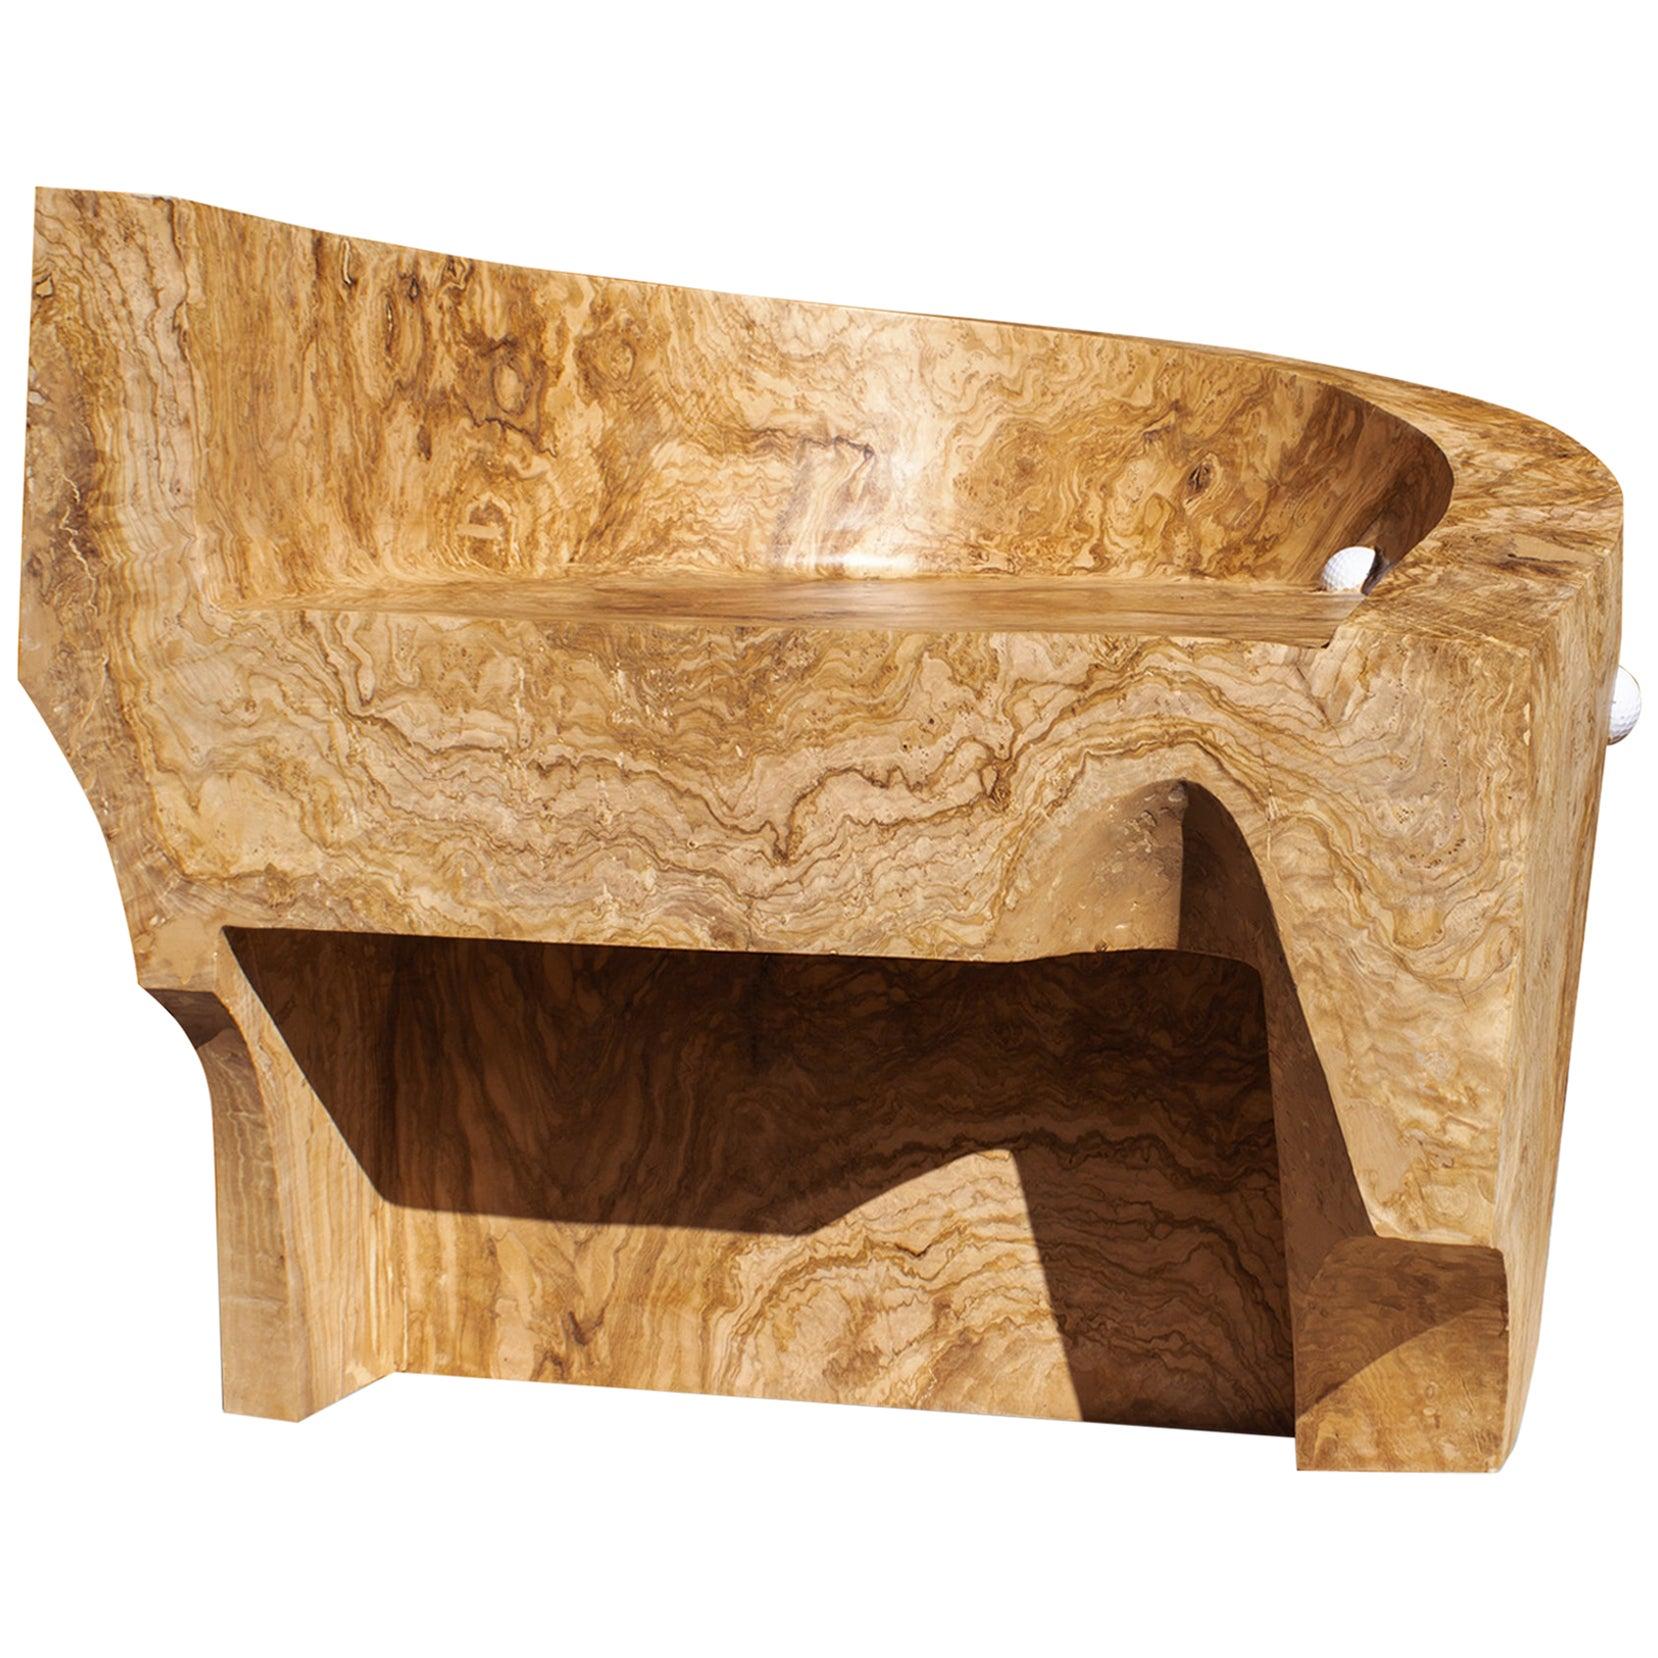 Minos Armchair by Woody Fidler